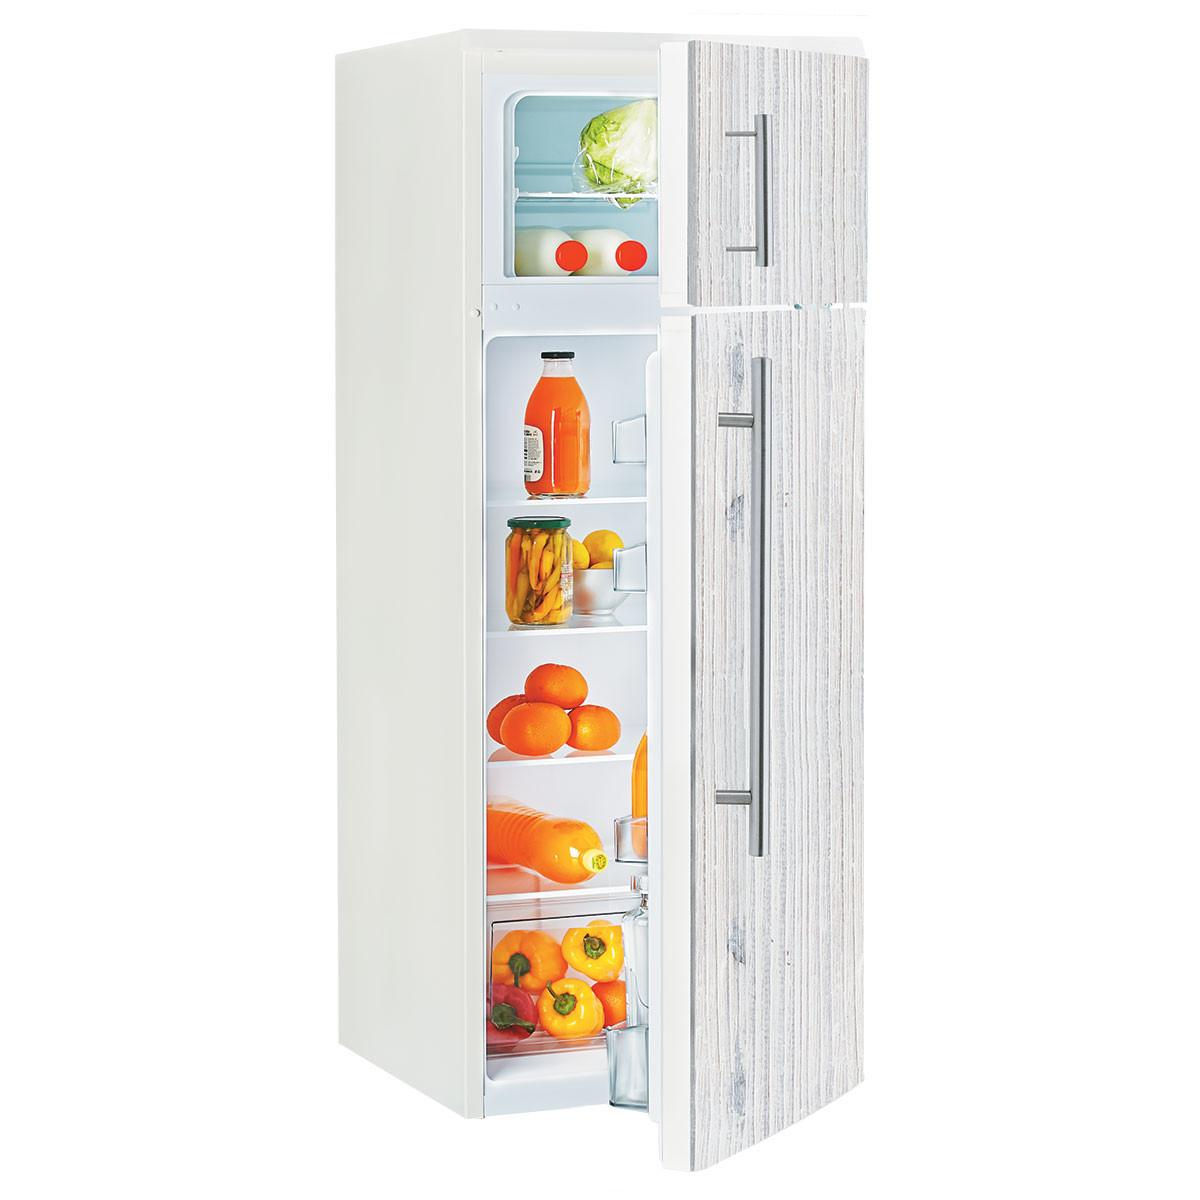 VOX IKG2600 (OS) FRIZIDER UGRADNI